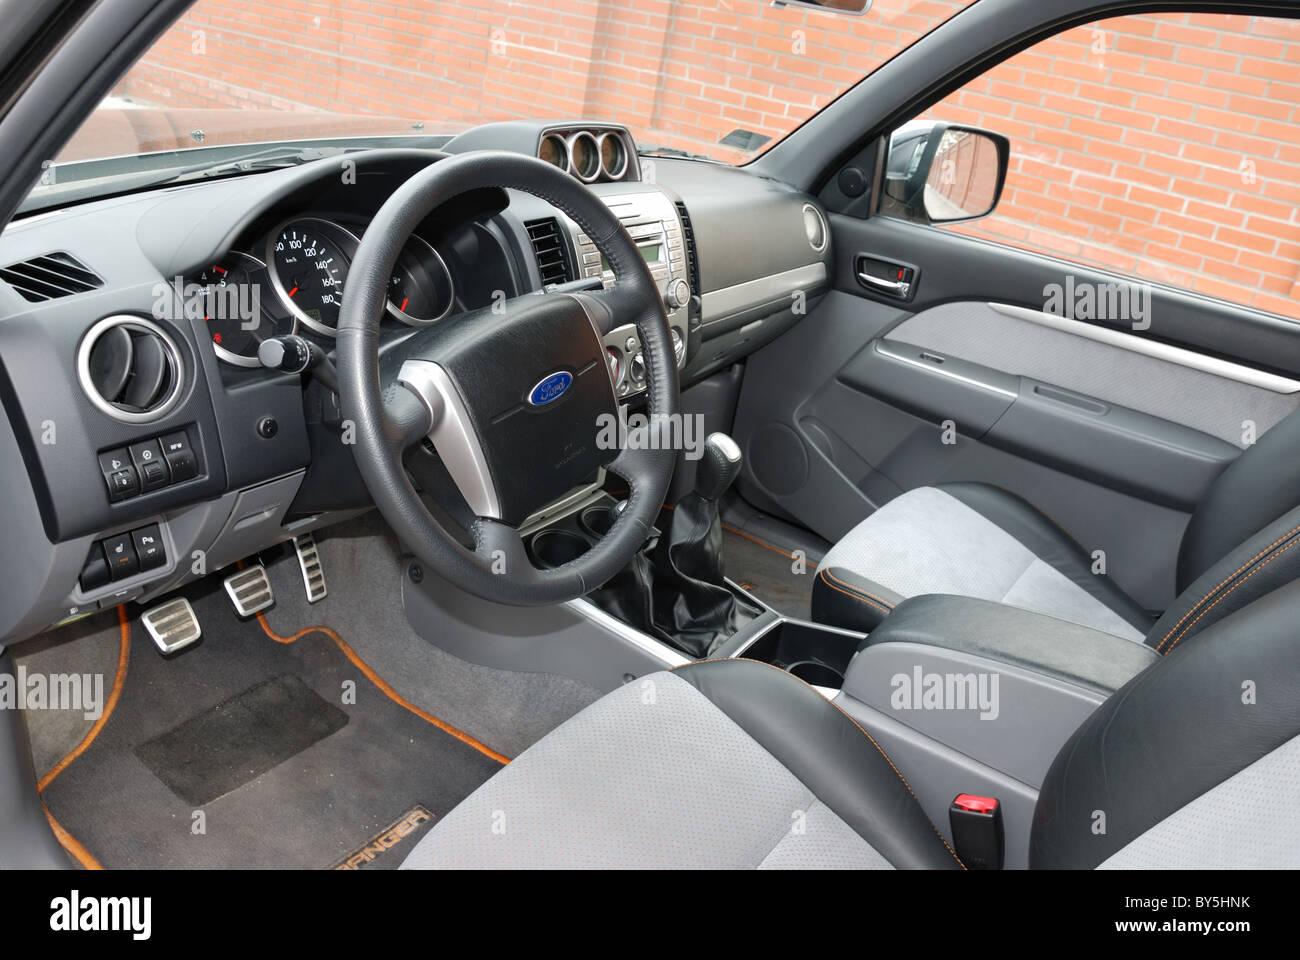 Truck Cab Interior Stockfotos & Truck Cab Interior Bilder - Alamy